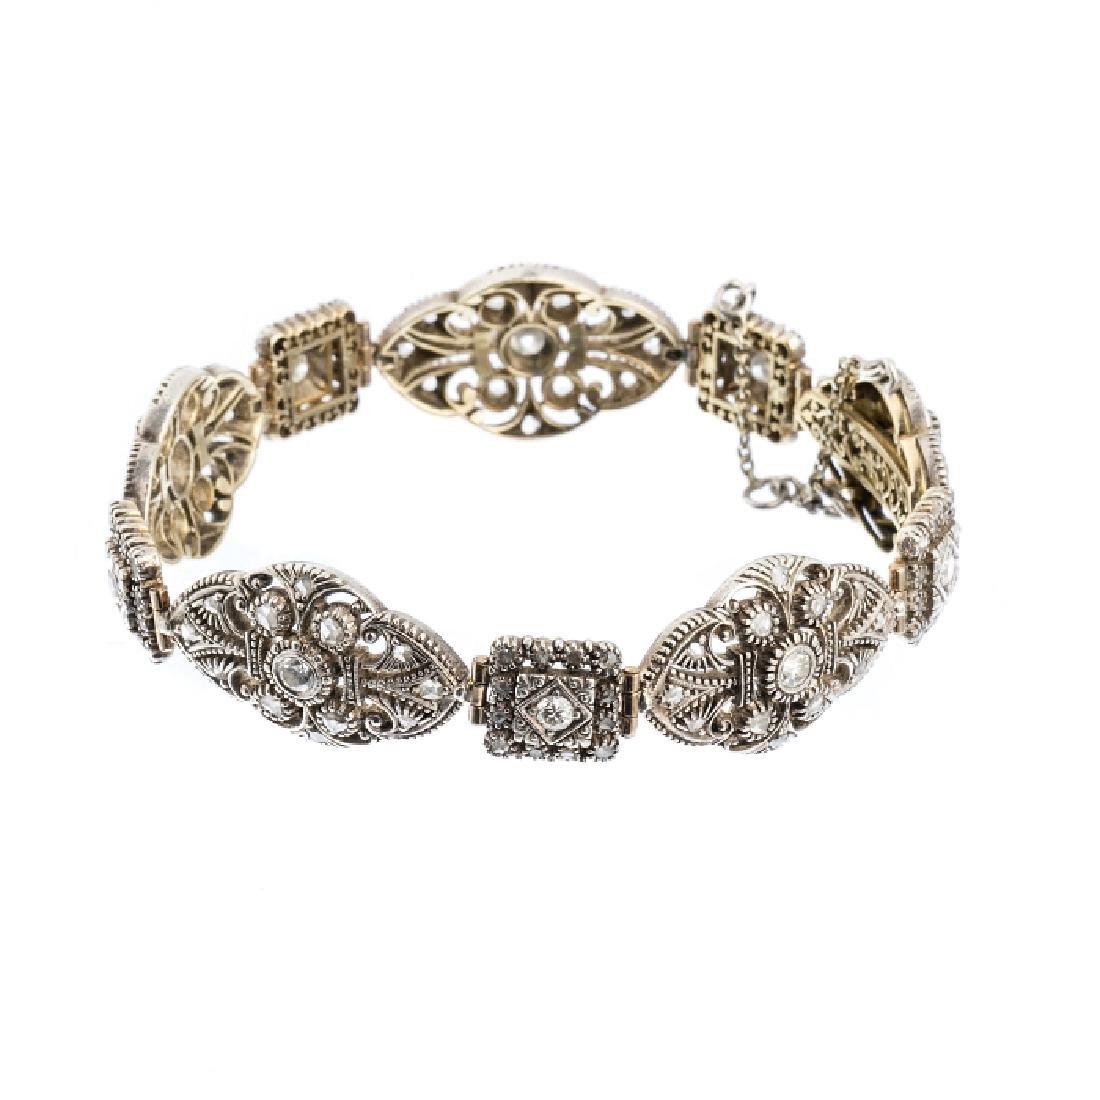 Gold, silver bracelet with diamonds